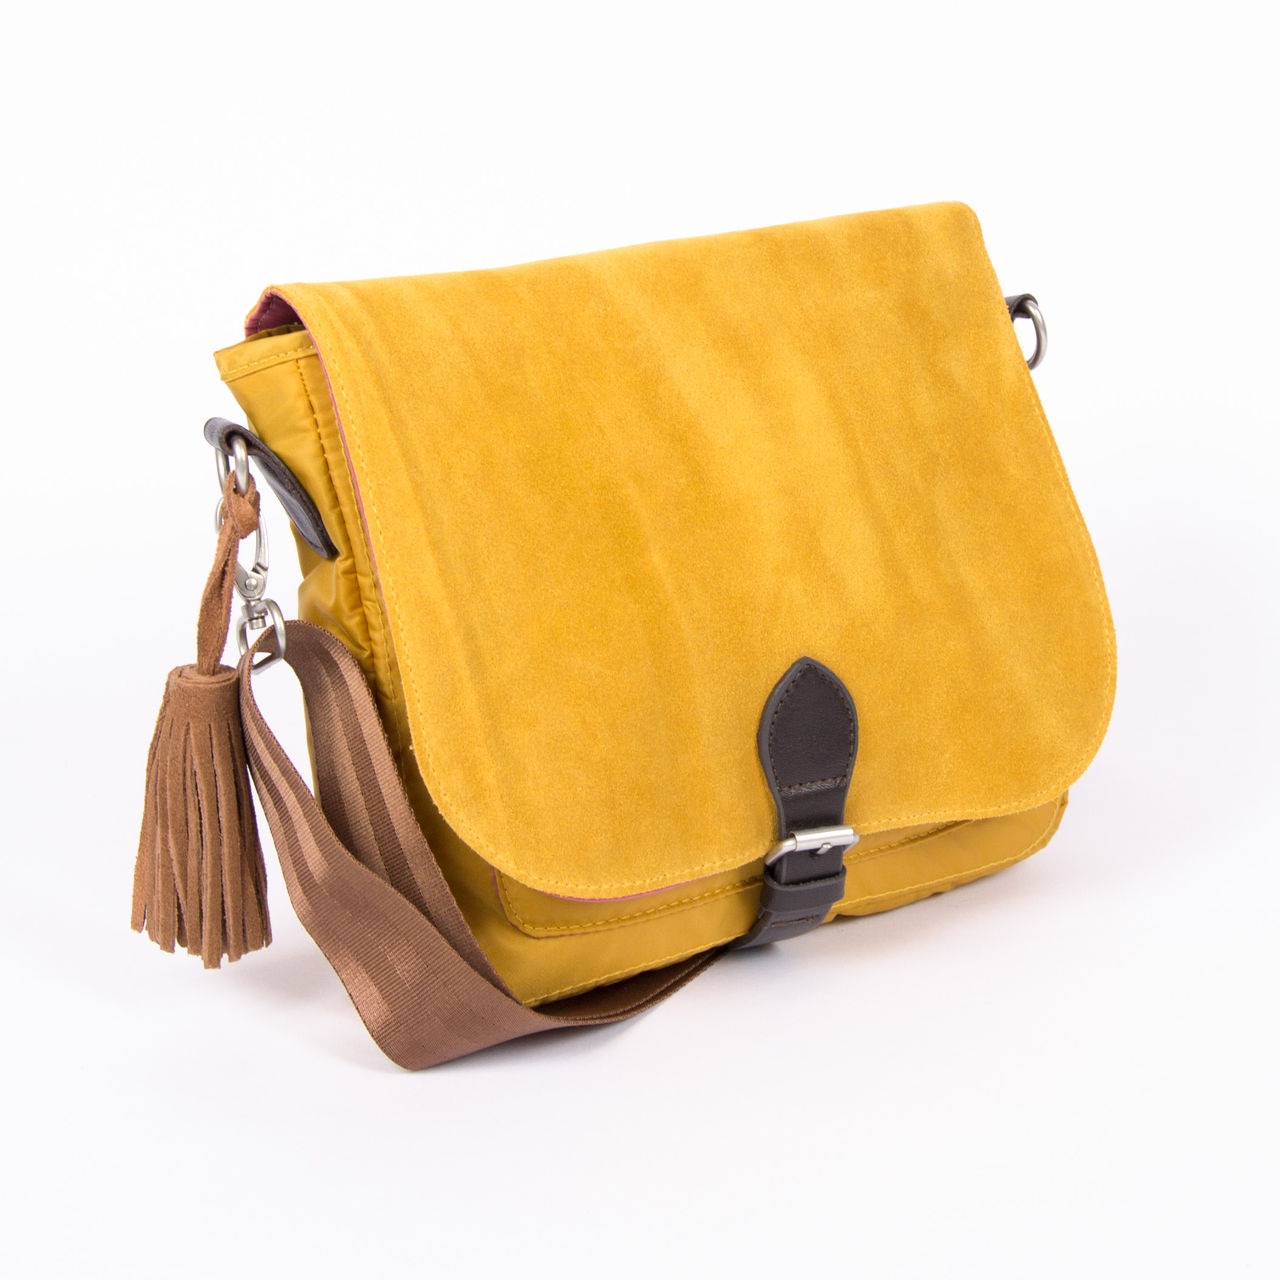 Bag Femme La gt;taschen Geschäft Mat Bensimon xRq45Uwp